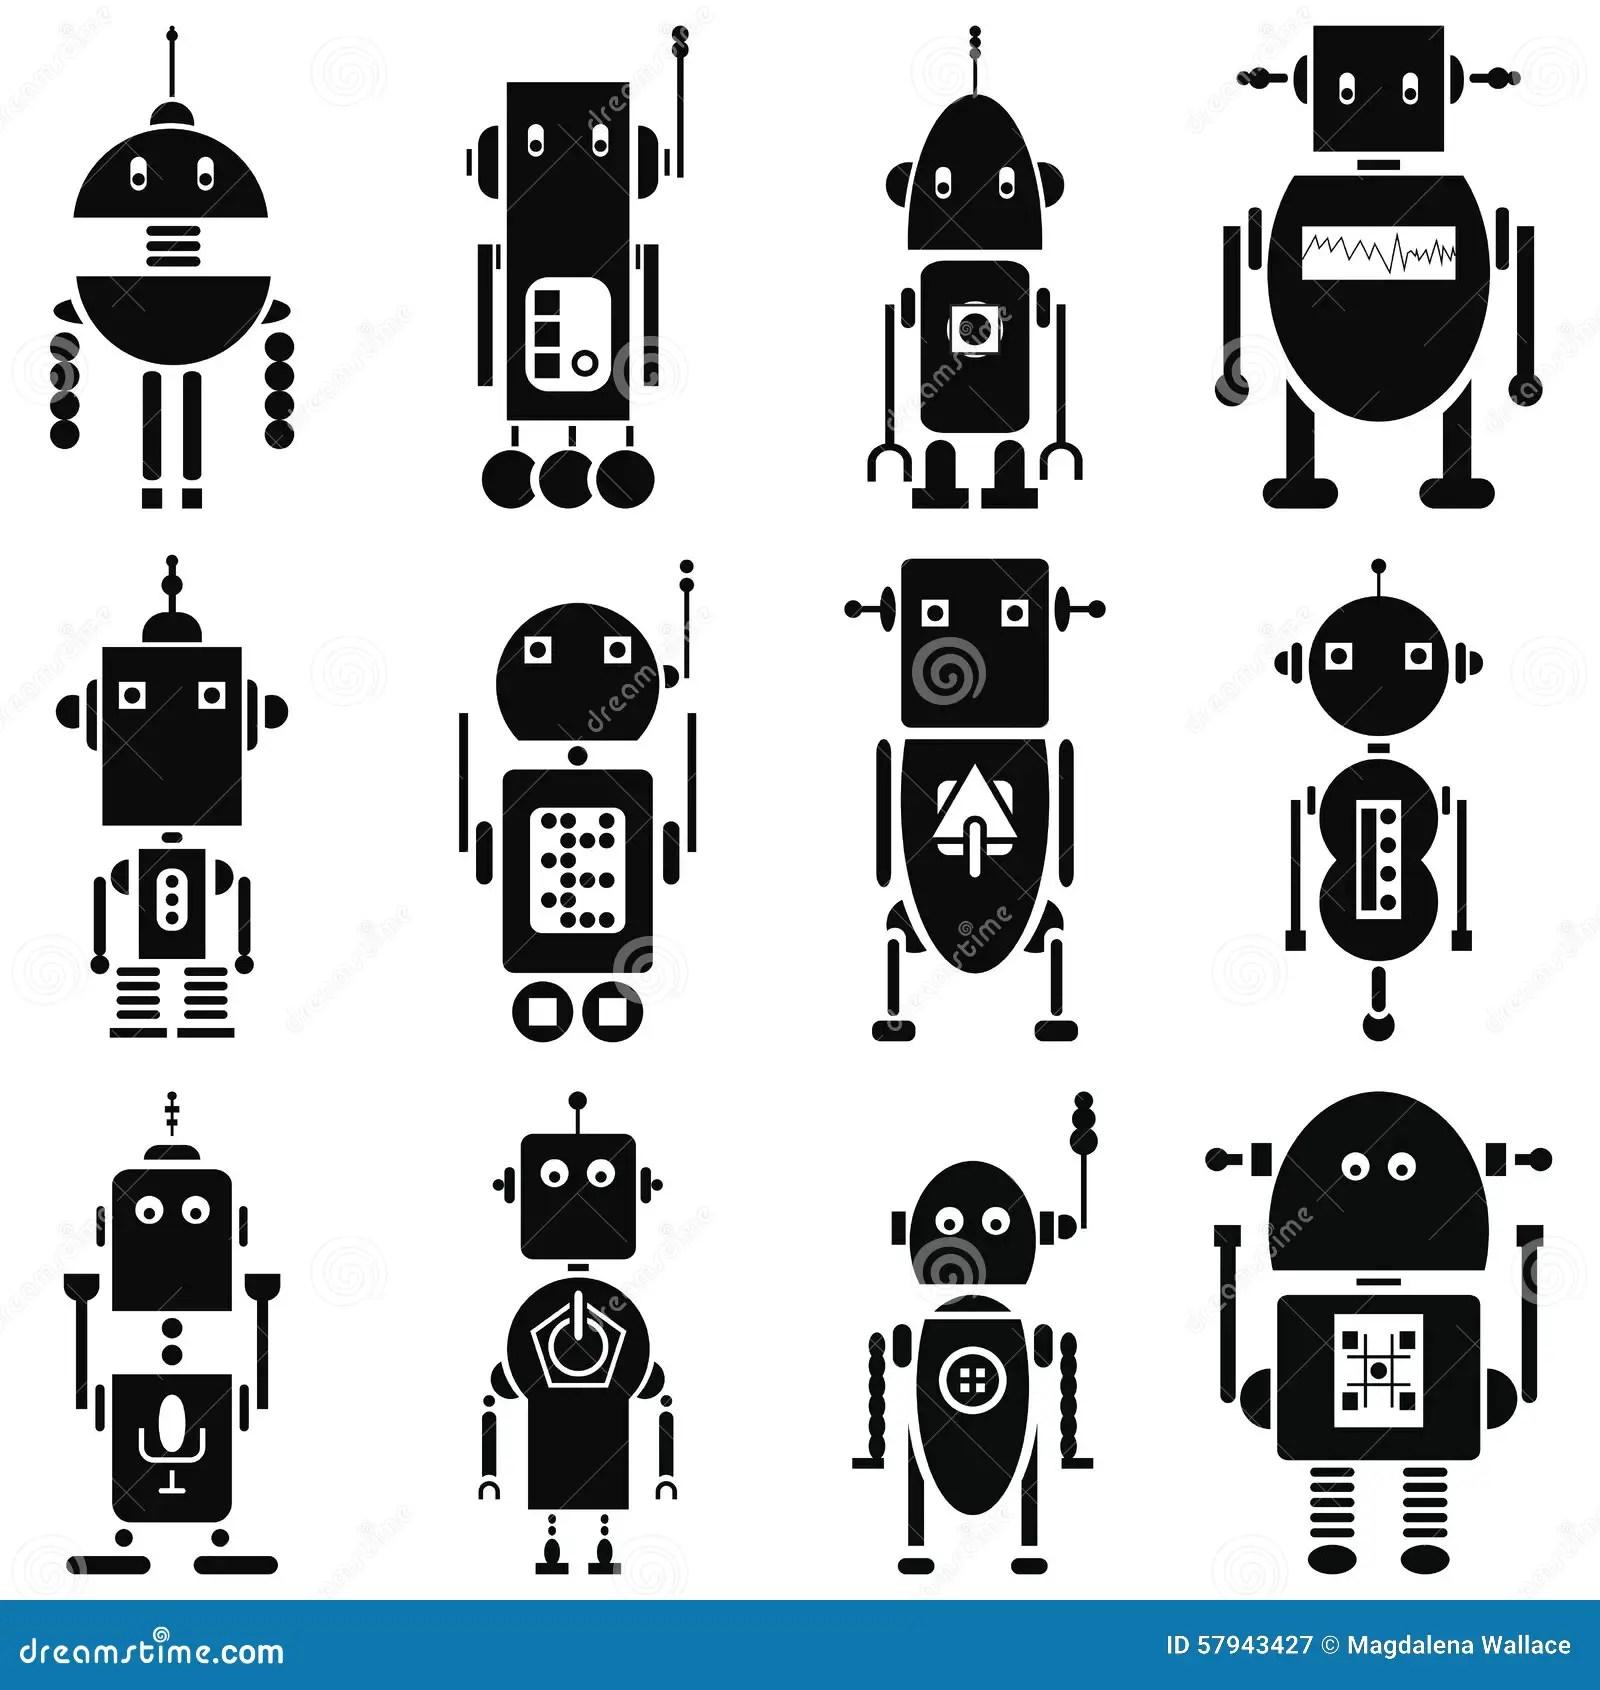 Vintage Retro Robots 2 Icons Set In Black And White Stock